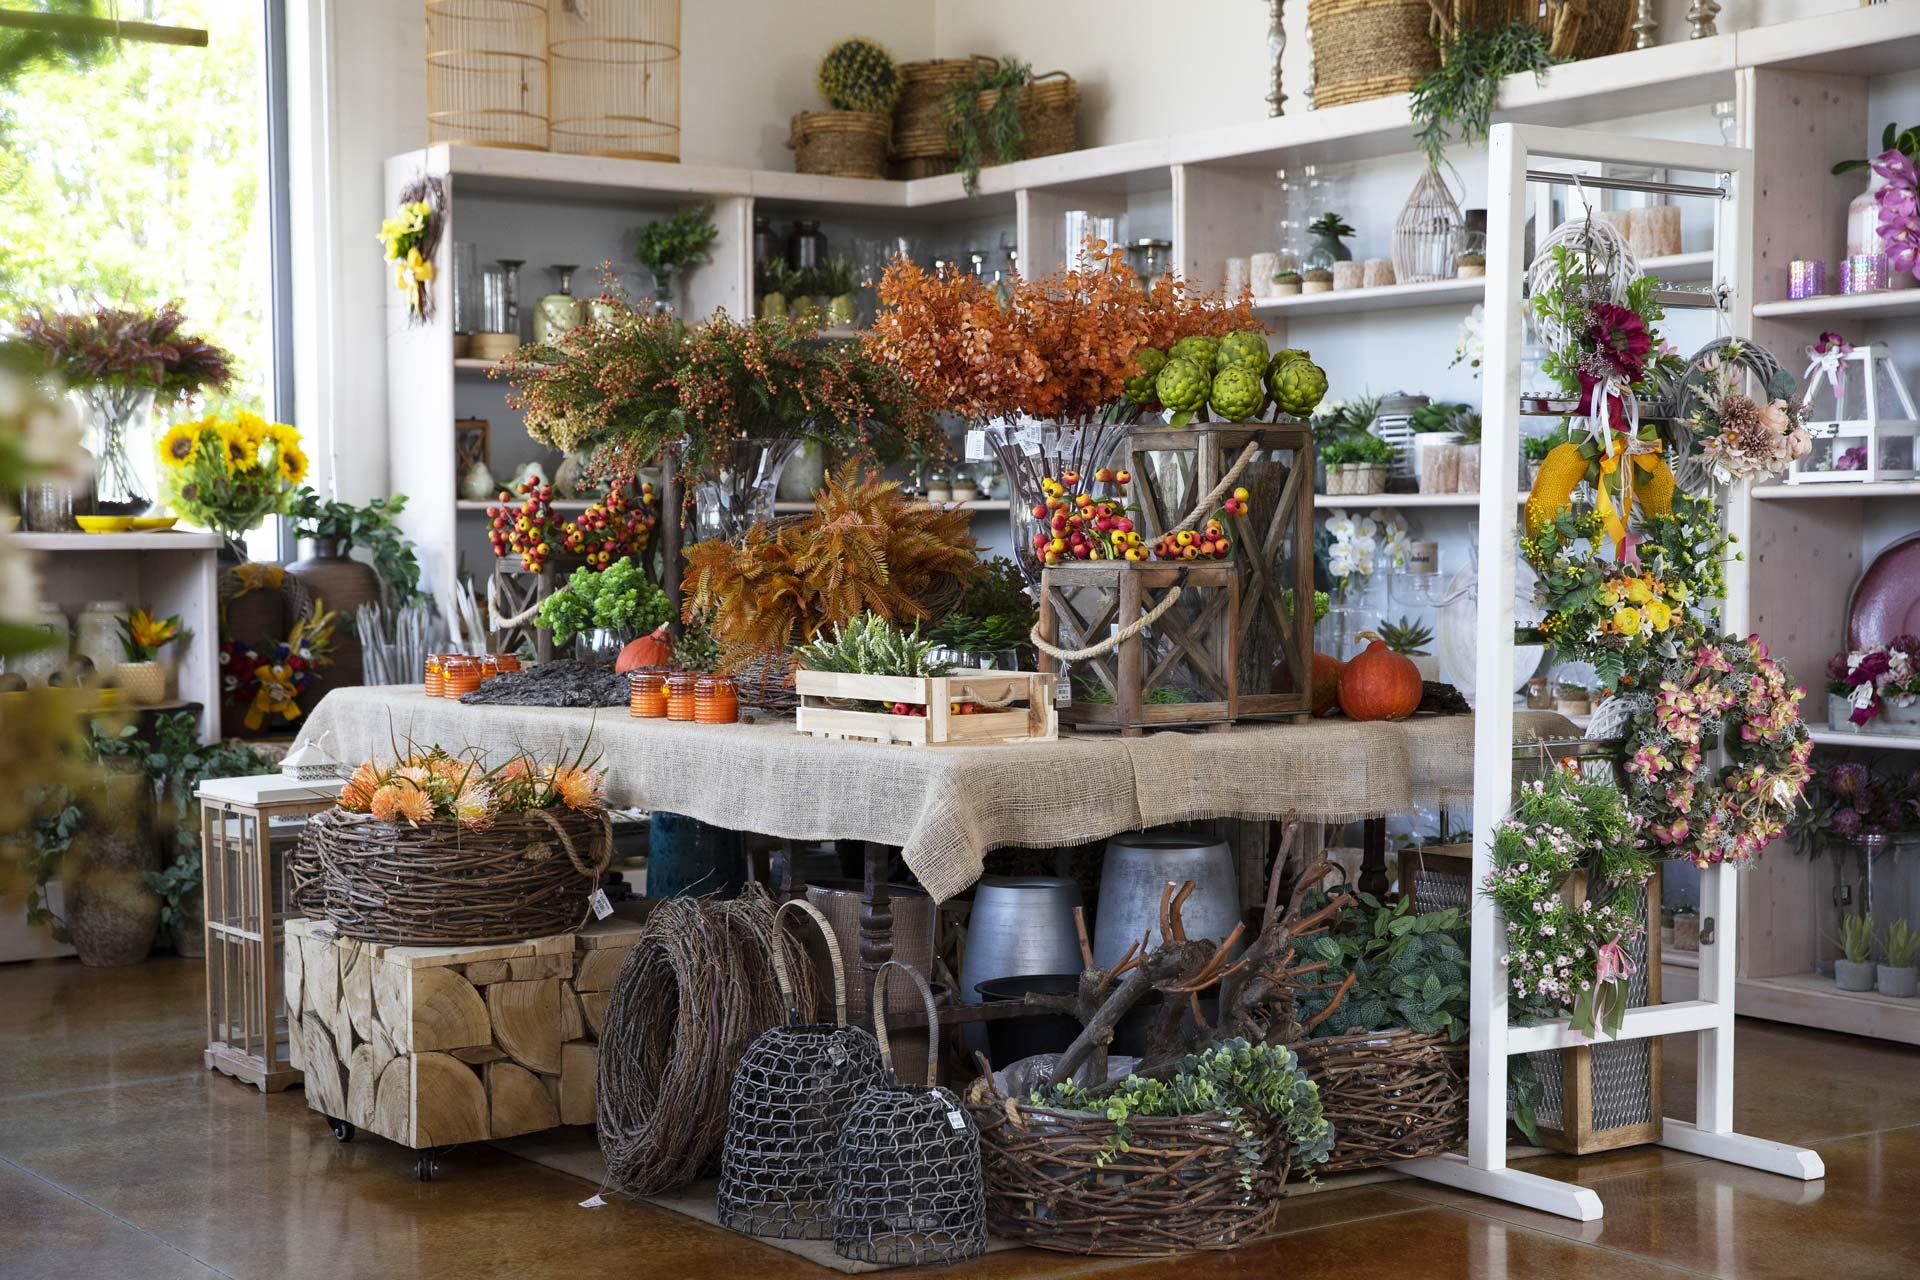 https://www.salmasogarden.it/wp-content/uploads/2020/11/reparti-salmaso-garden-decorazioni-per-la-casa.jpg